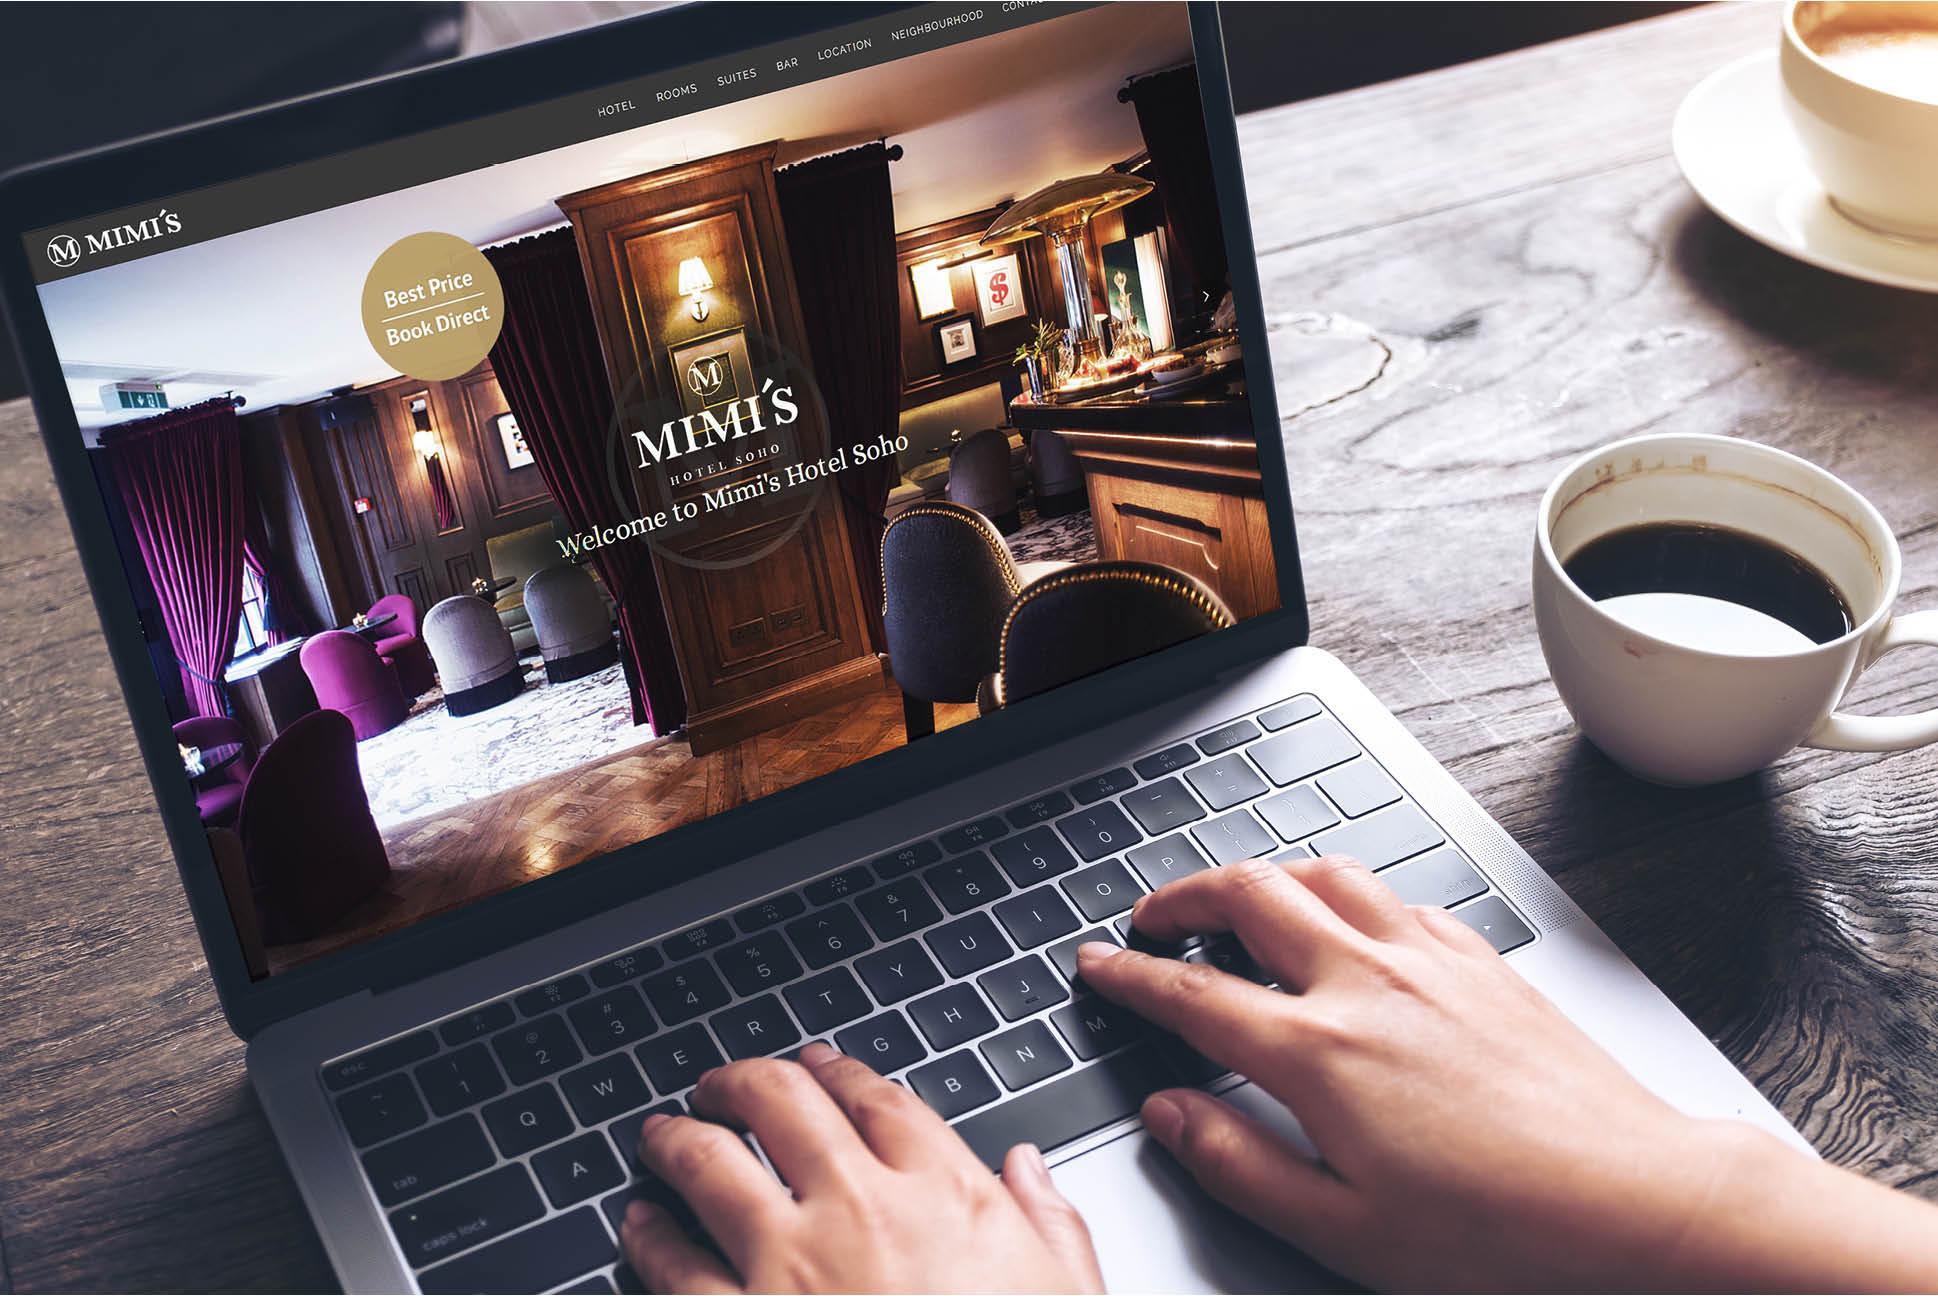 Mimi's Hotel Soho website | Independent Marketing - IM London | Hospitality and Hotel Branding | Mimi's Hotel